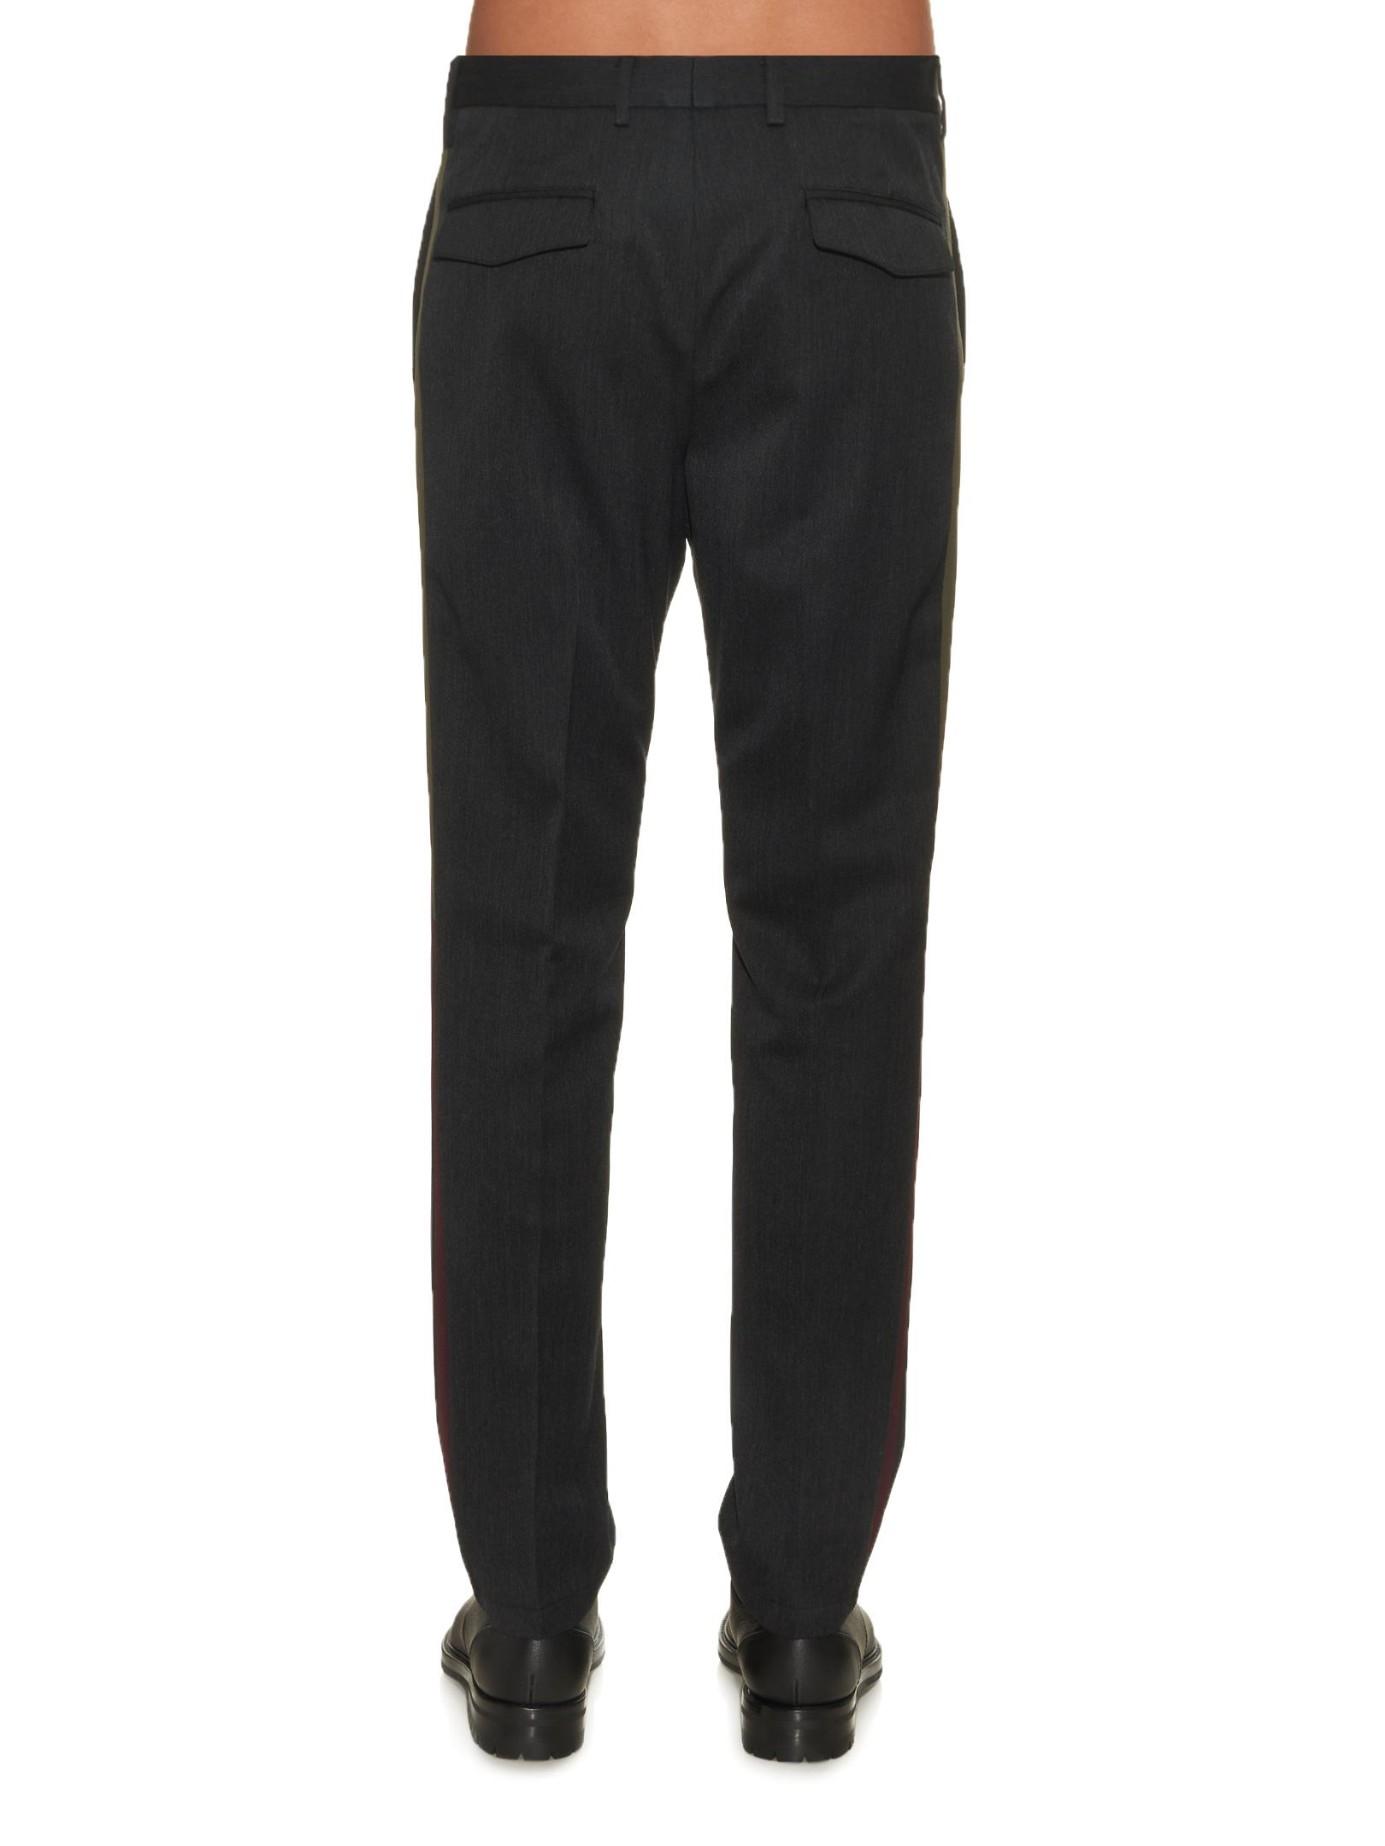 Wool trousers grey Valentino GMJFVs4s